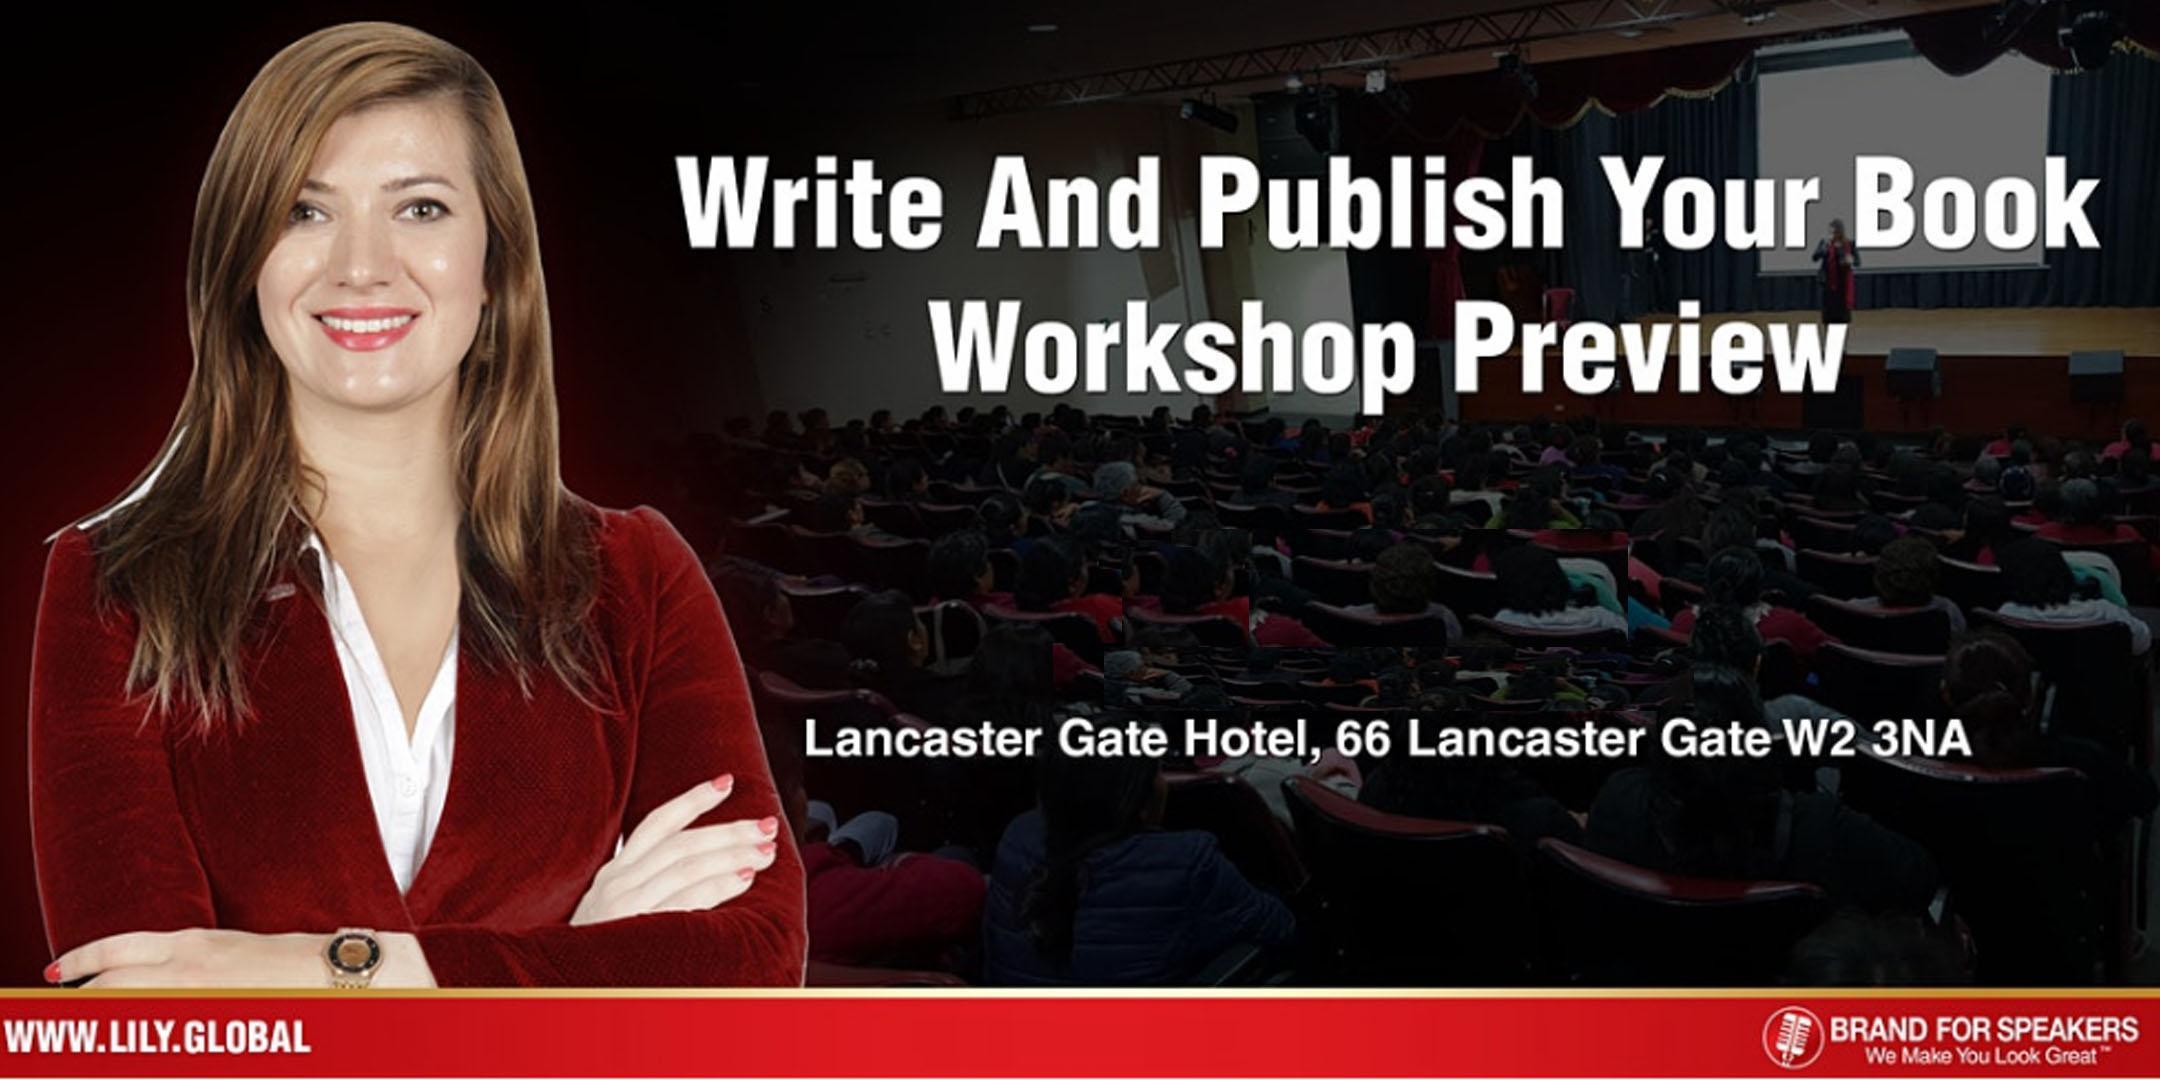 Writing A Self Help Book - Workshop 11 April 2020 Noon